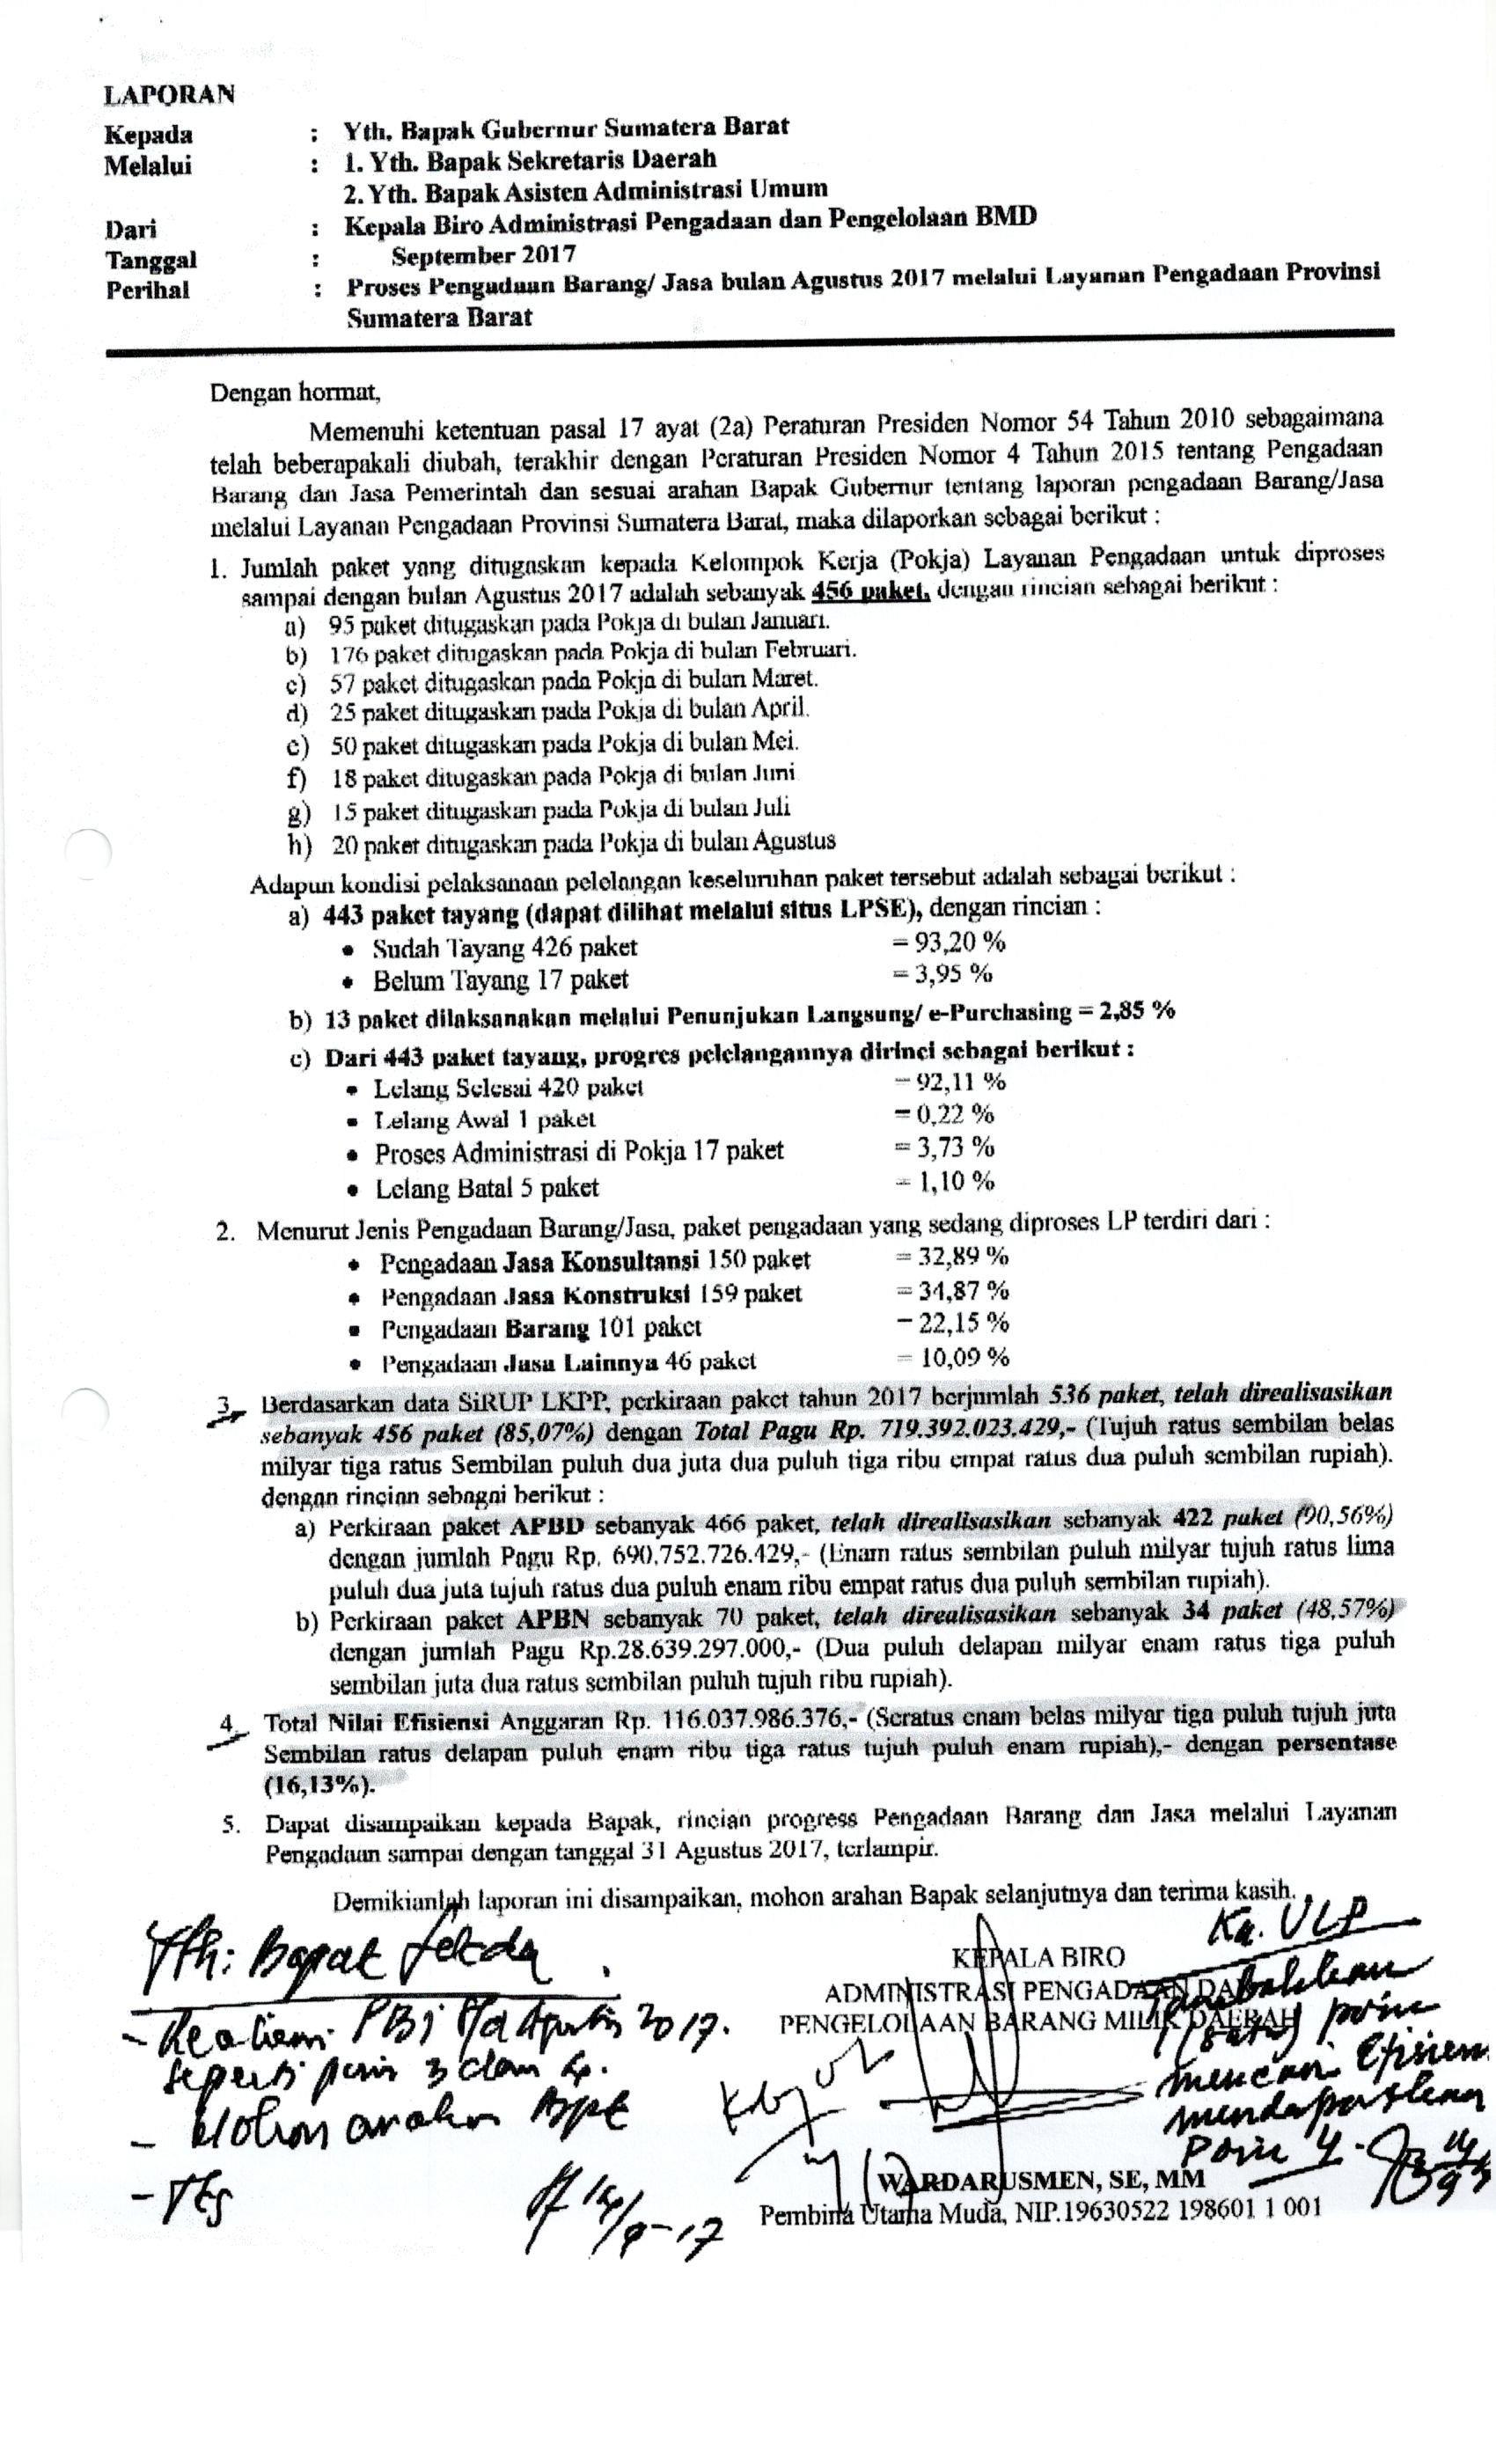 Proses Pengadaan Barang/Jasa Bulan Agustus 2017 Melalui Layanan Pengadaan Provinsi Sumatera Barat